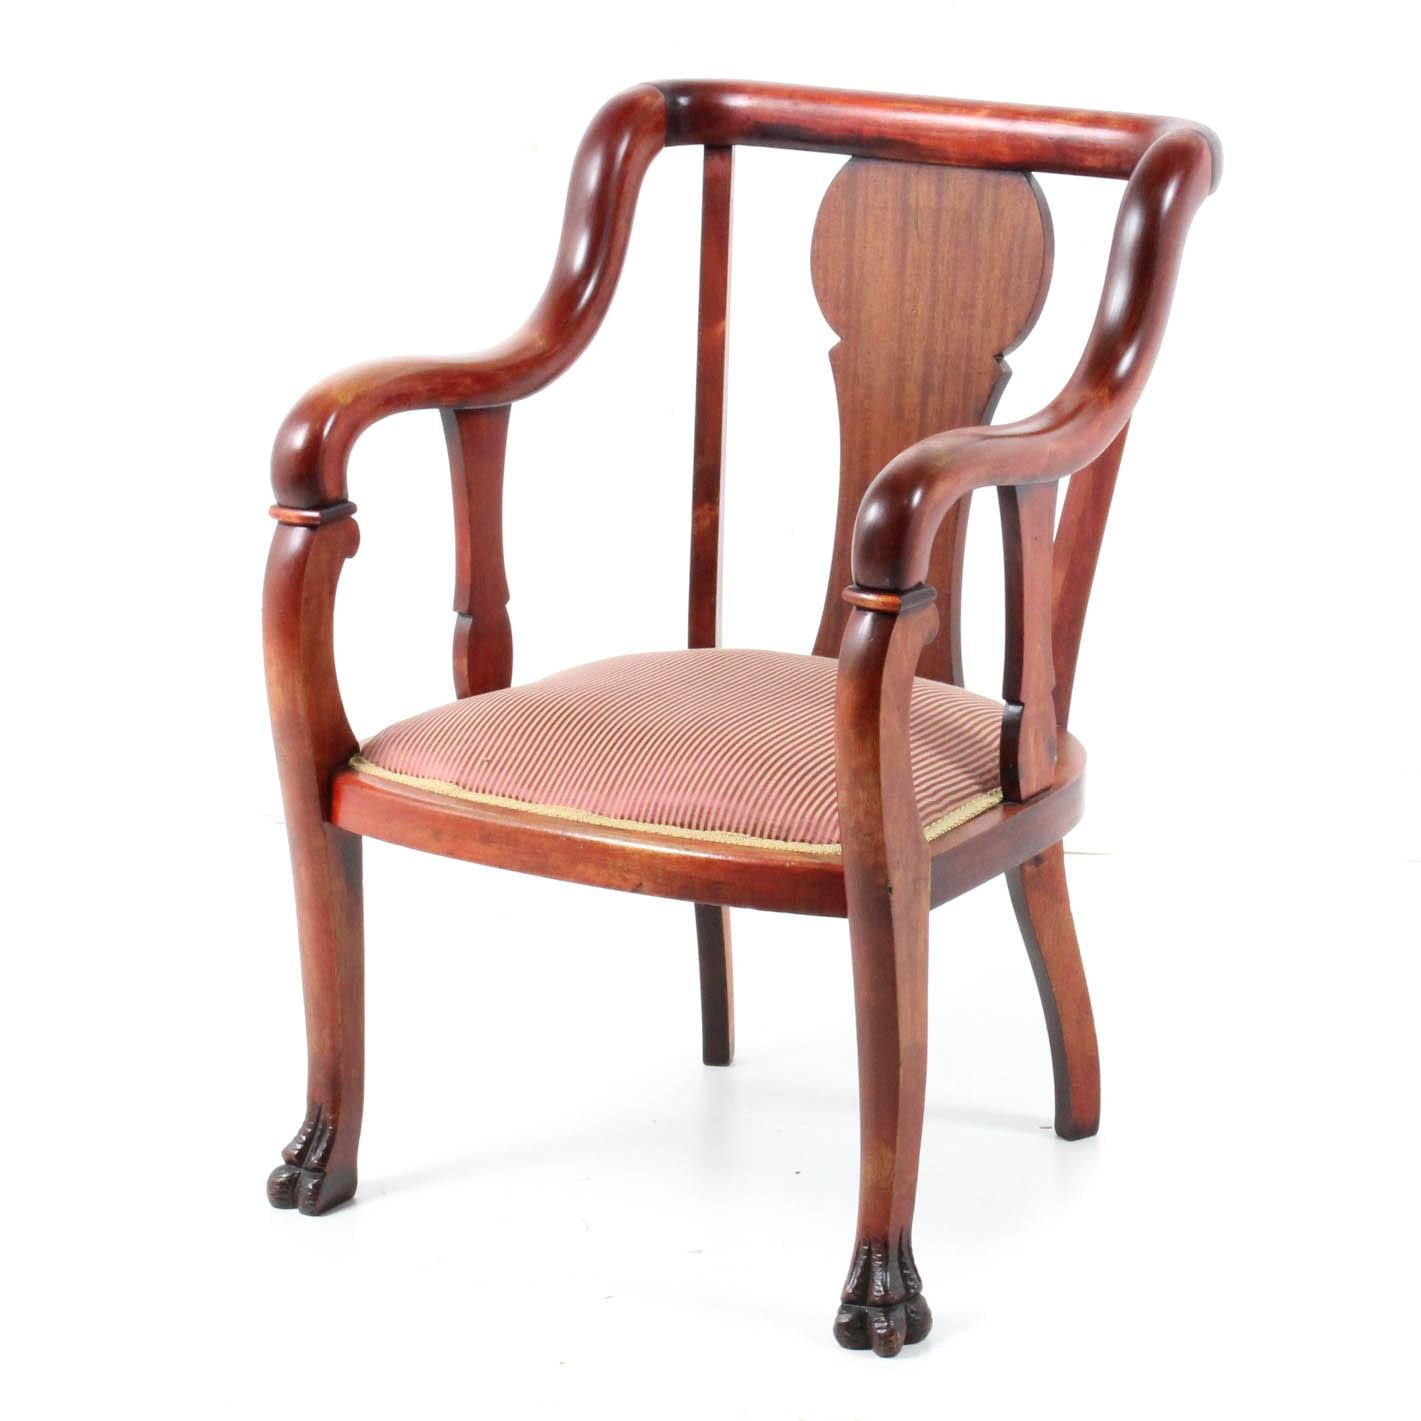 Vintage Queen Anne-Style Wooden Armchair